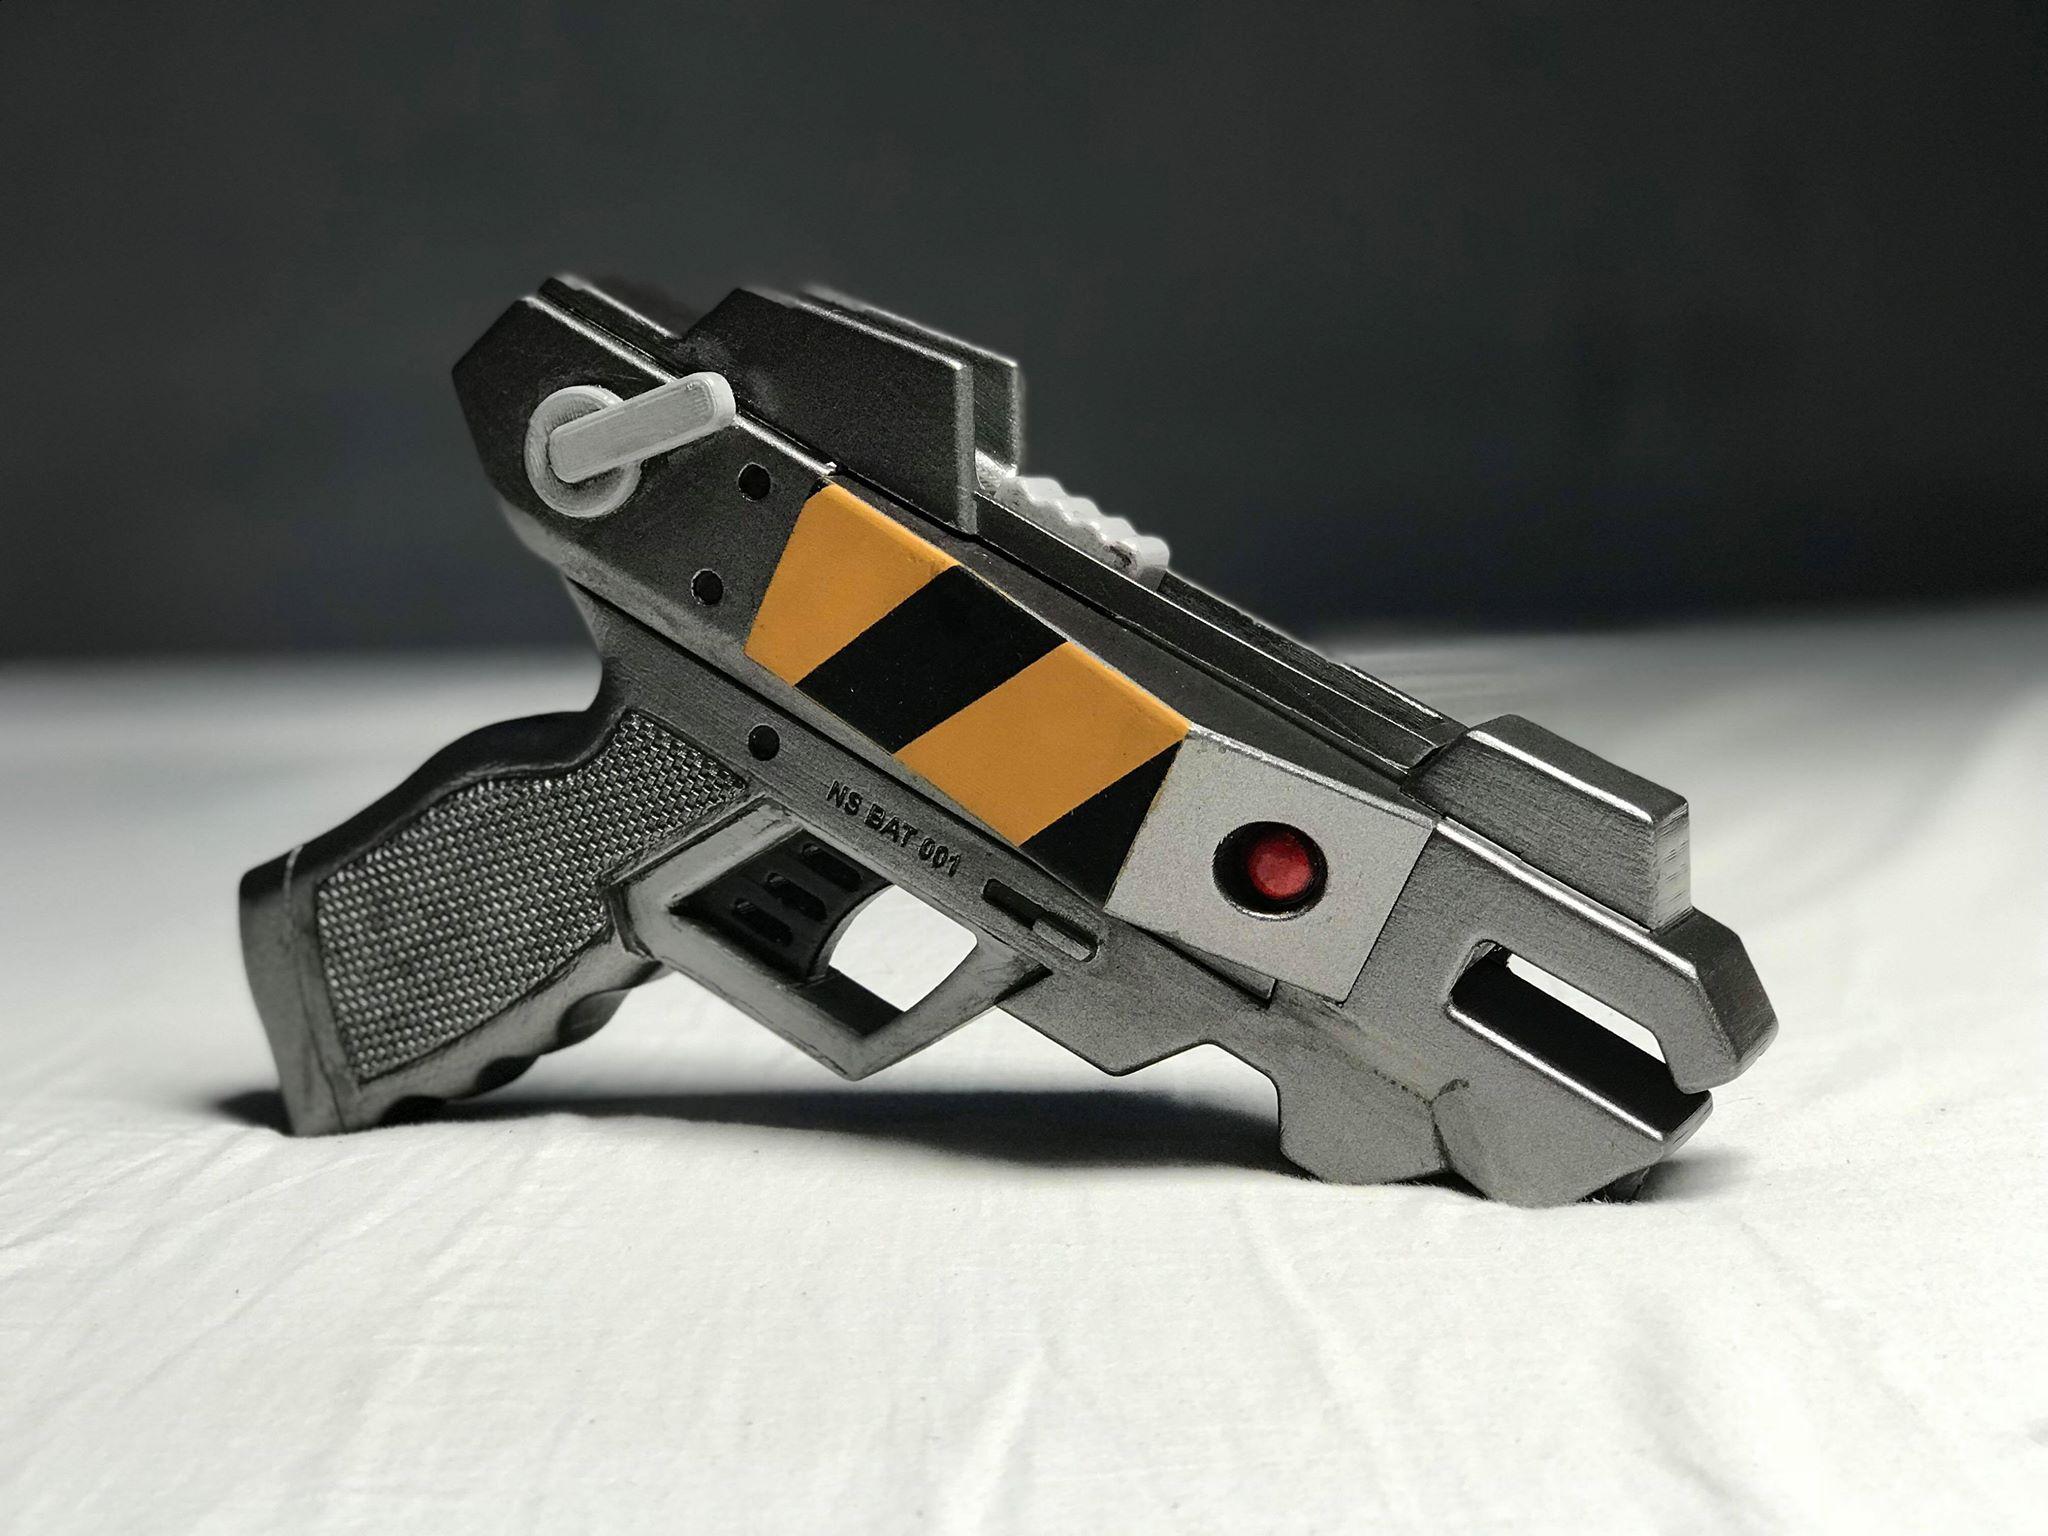 Batman Batarang Gun